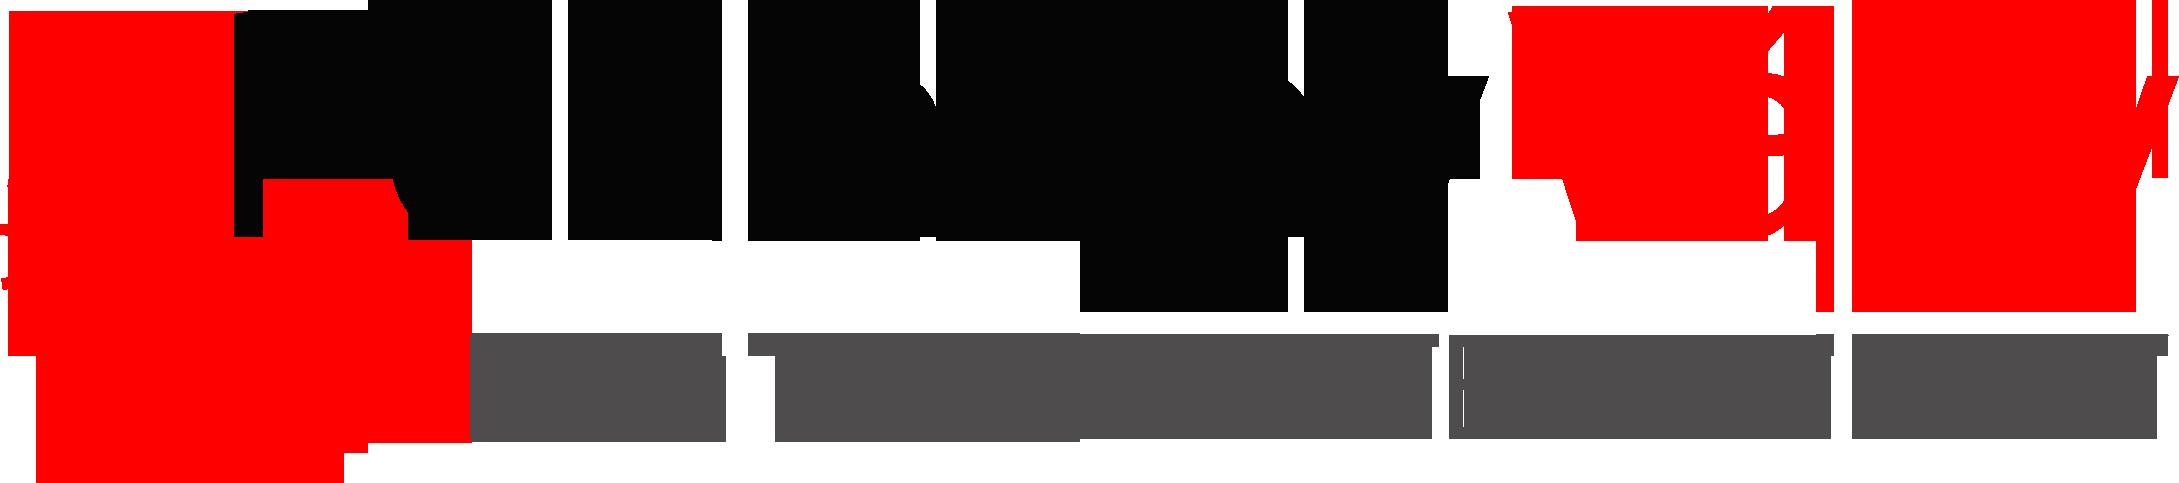 váhy Pokladny-vahy.cz